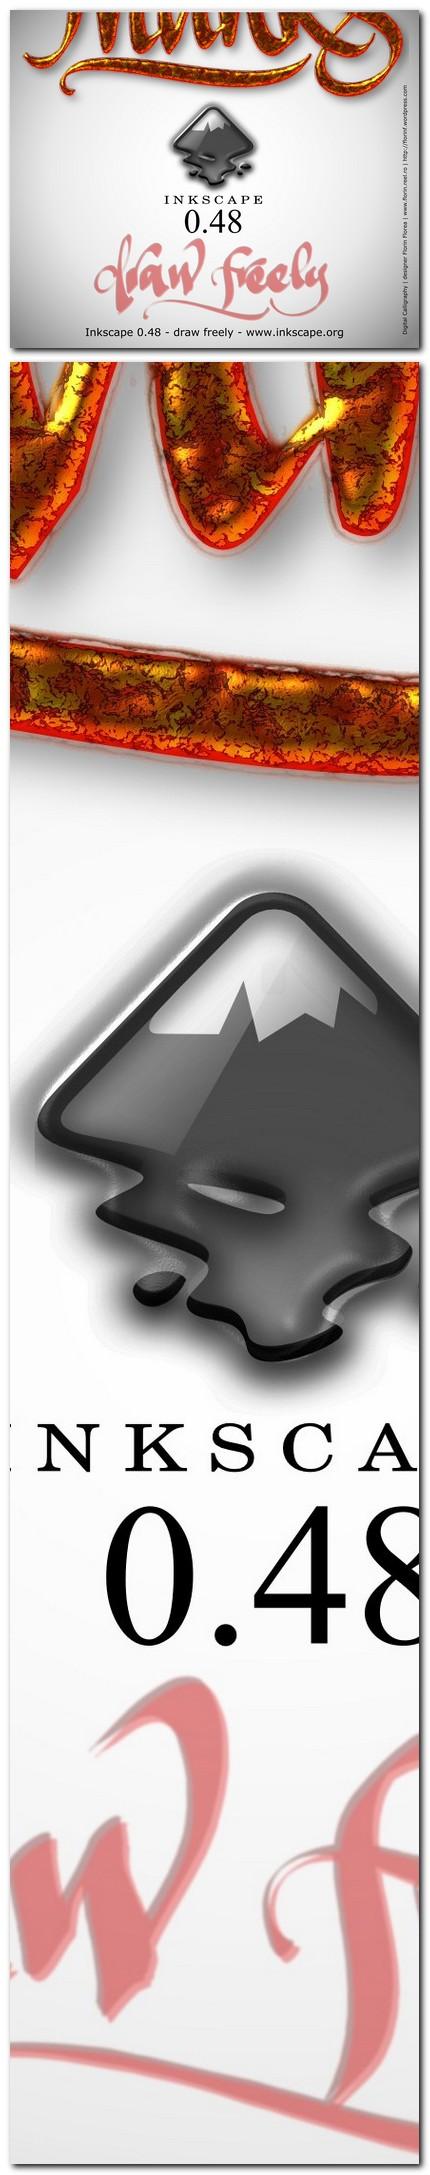 "08 ecran ""About Inkscape"" varianta netrimisa - florinf"